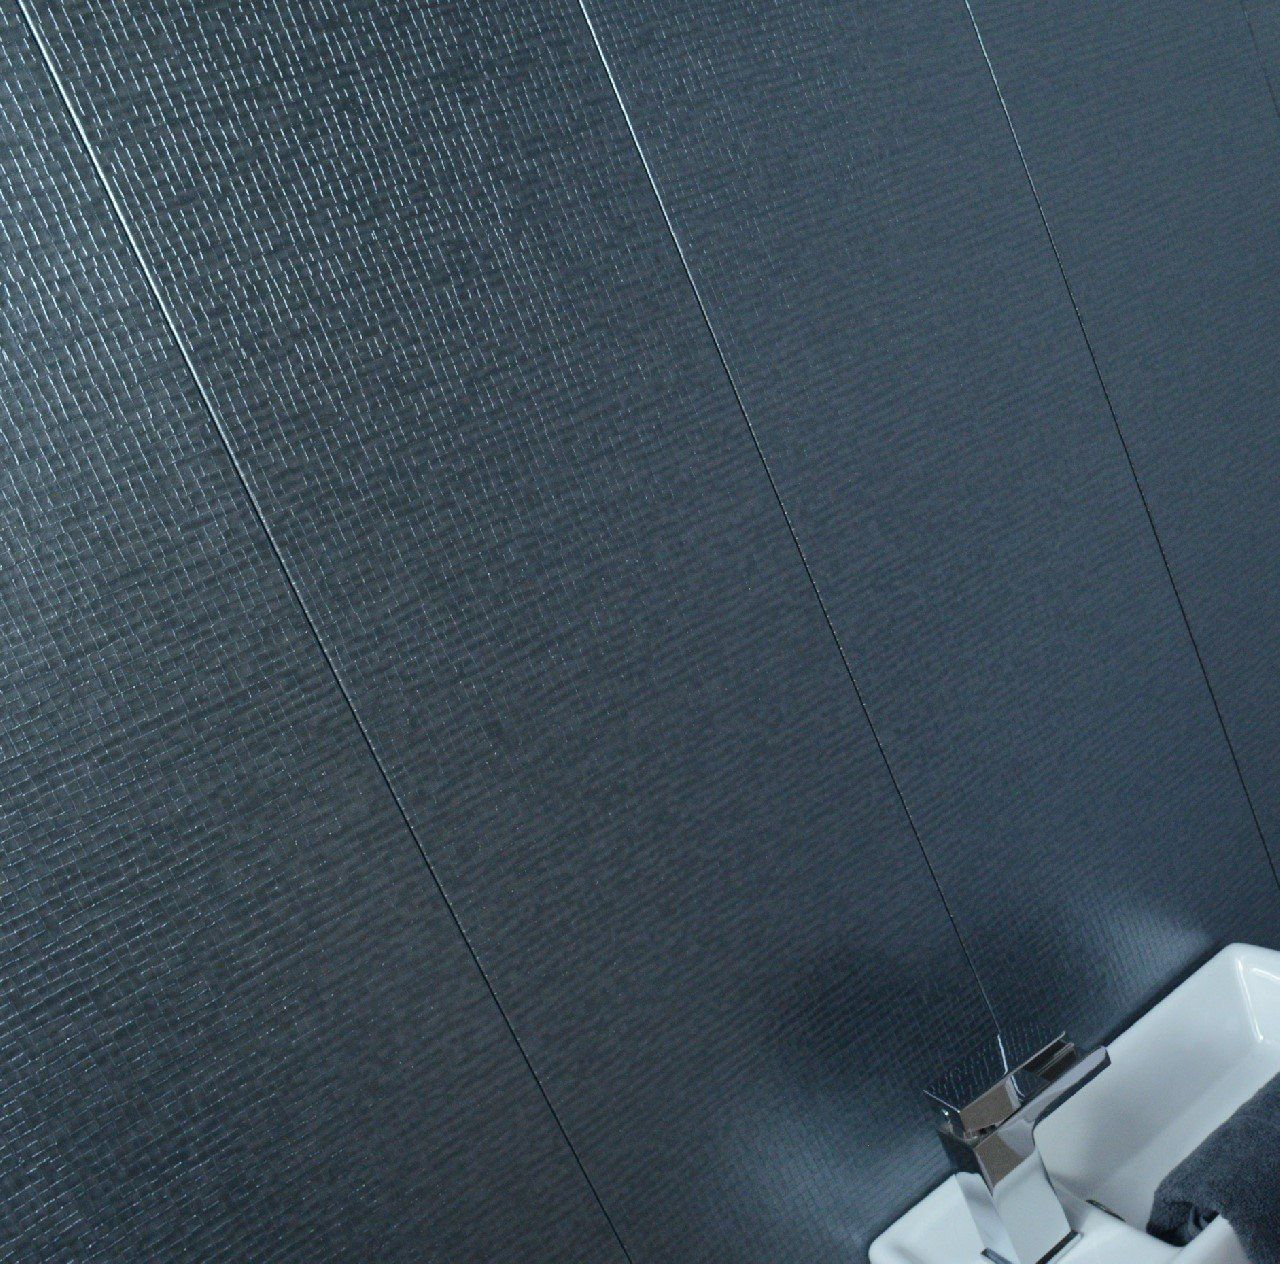 Claddtech Delux Large Wall And Ceiling Panels Mineral Montage Dark Shimmer Grey Textured Boar Bathroom Wall Tile Design Bathroom Paneling Large Tile Bathroom